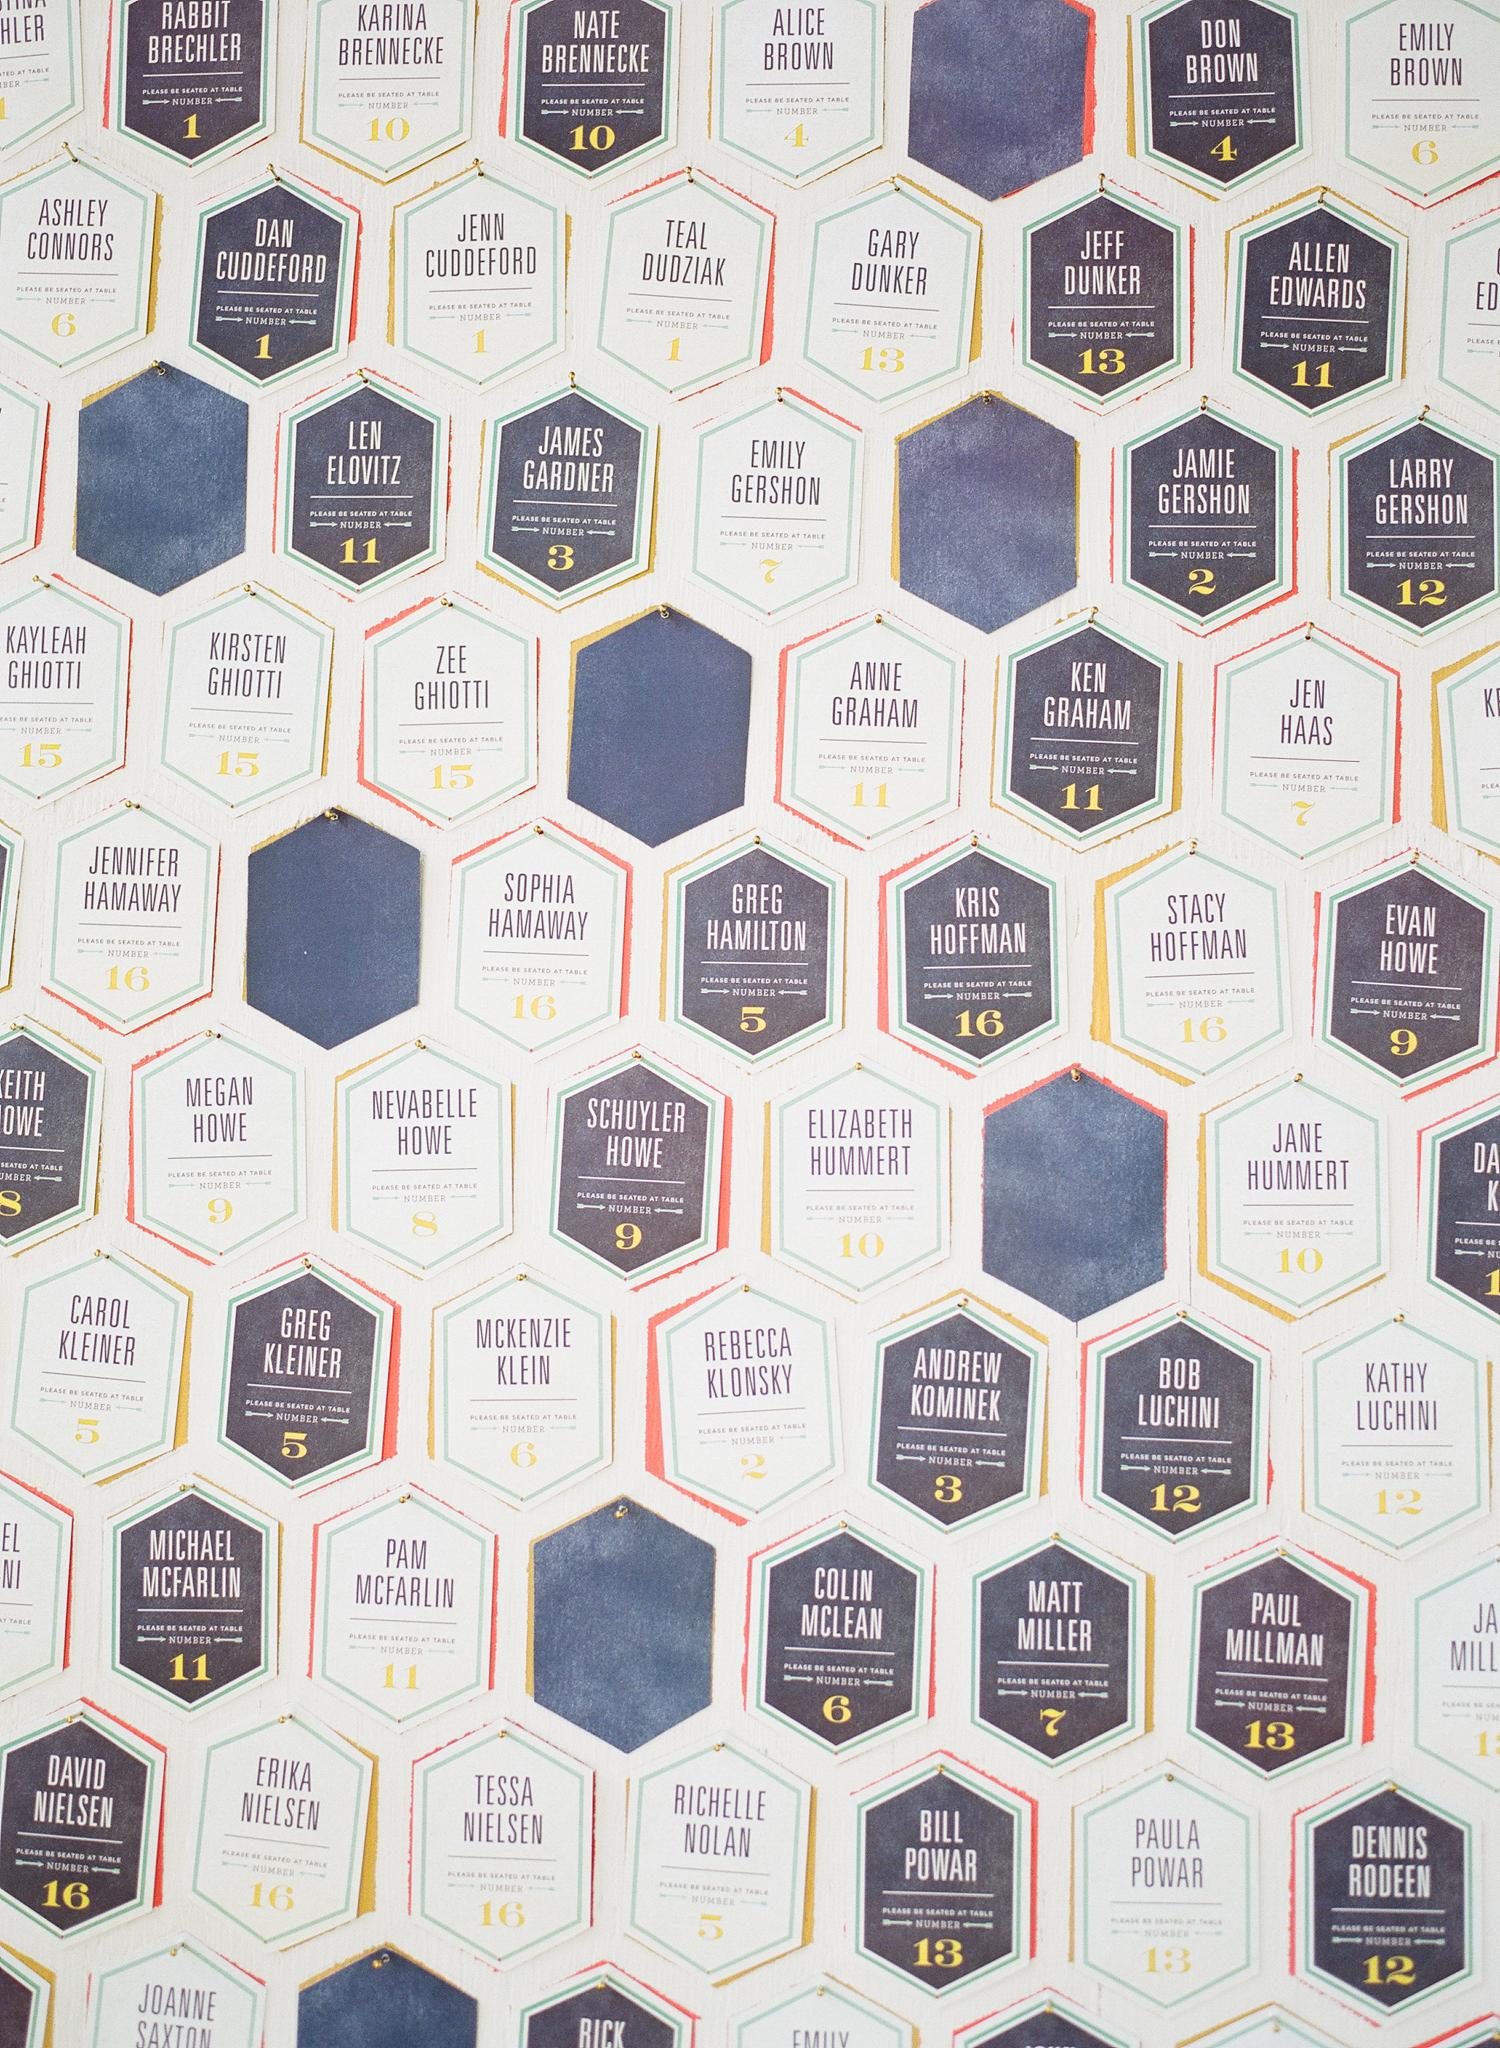 37-hexagon-escort-card-display.jpg